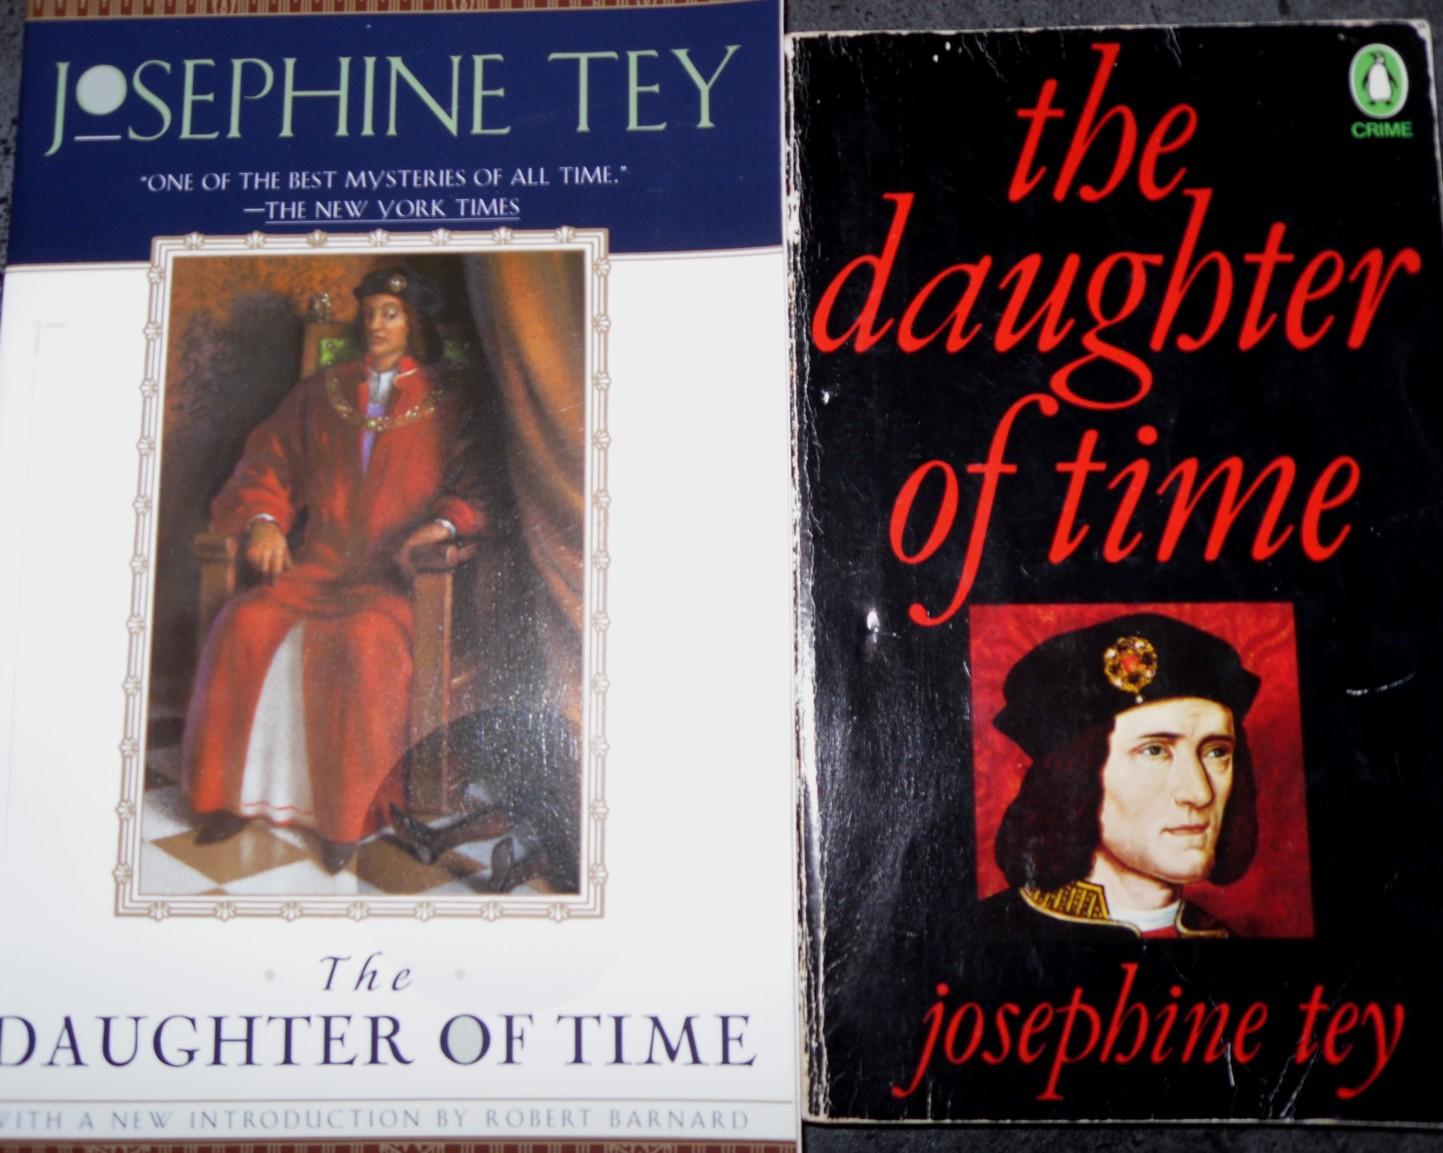 I prefer reading: Rejecting Tonypandy